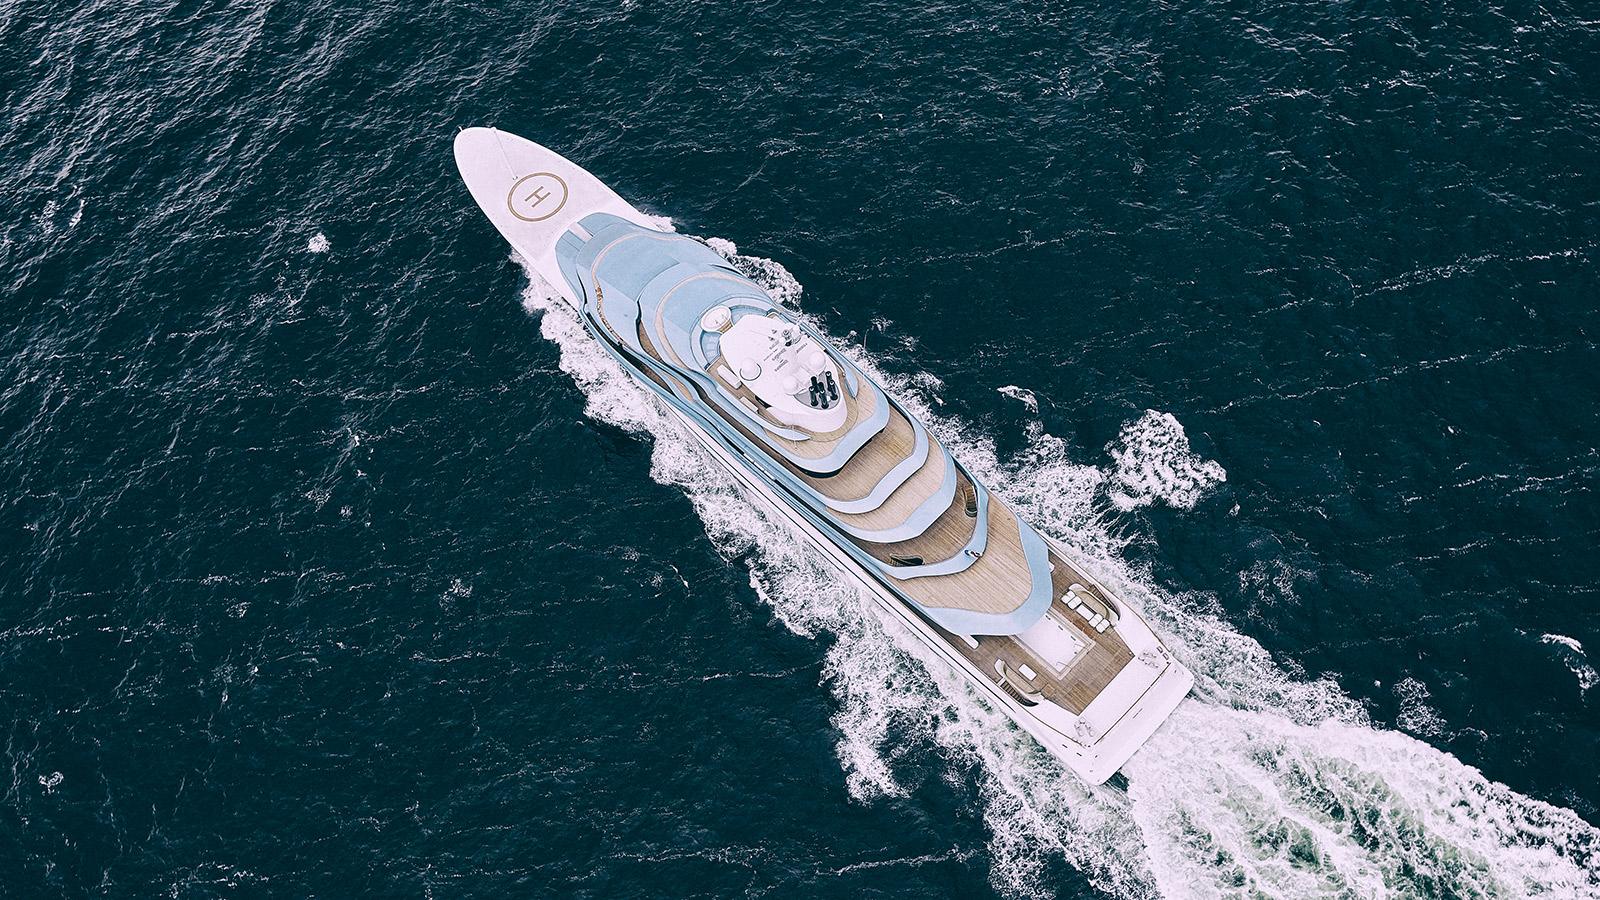 the-110-metre-oceanco-superyacht-jubilee-features-exterior-design-by-igor-lobanov